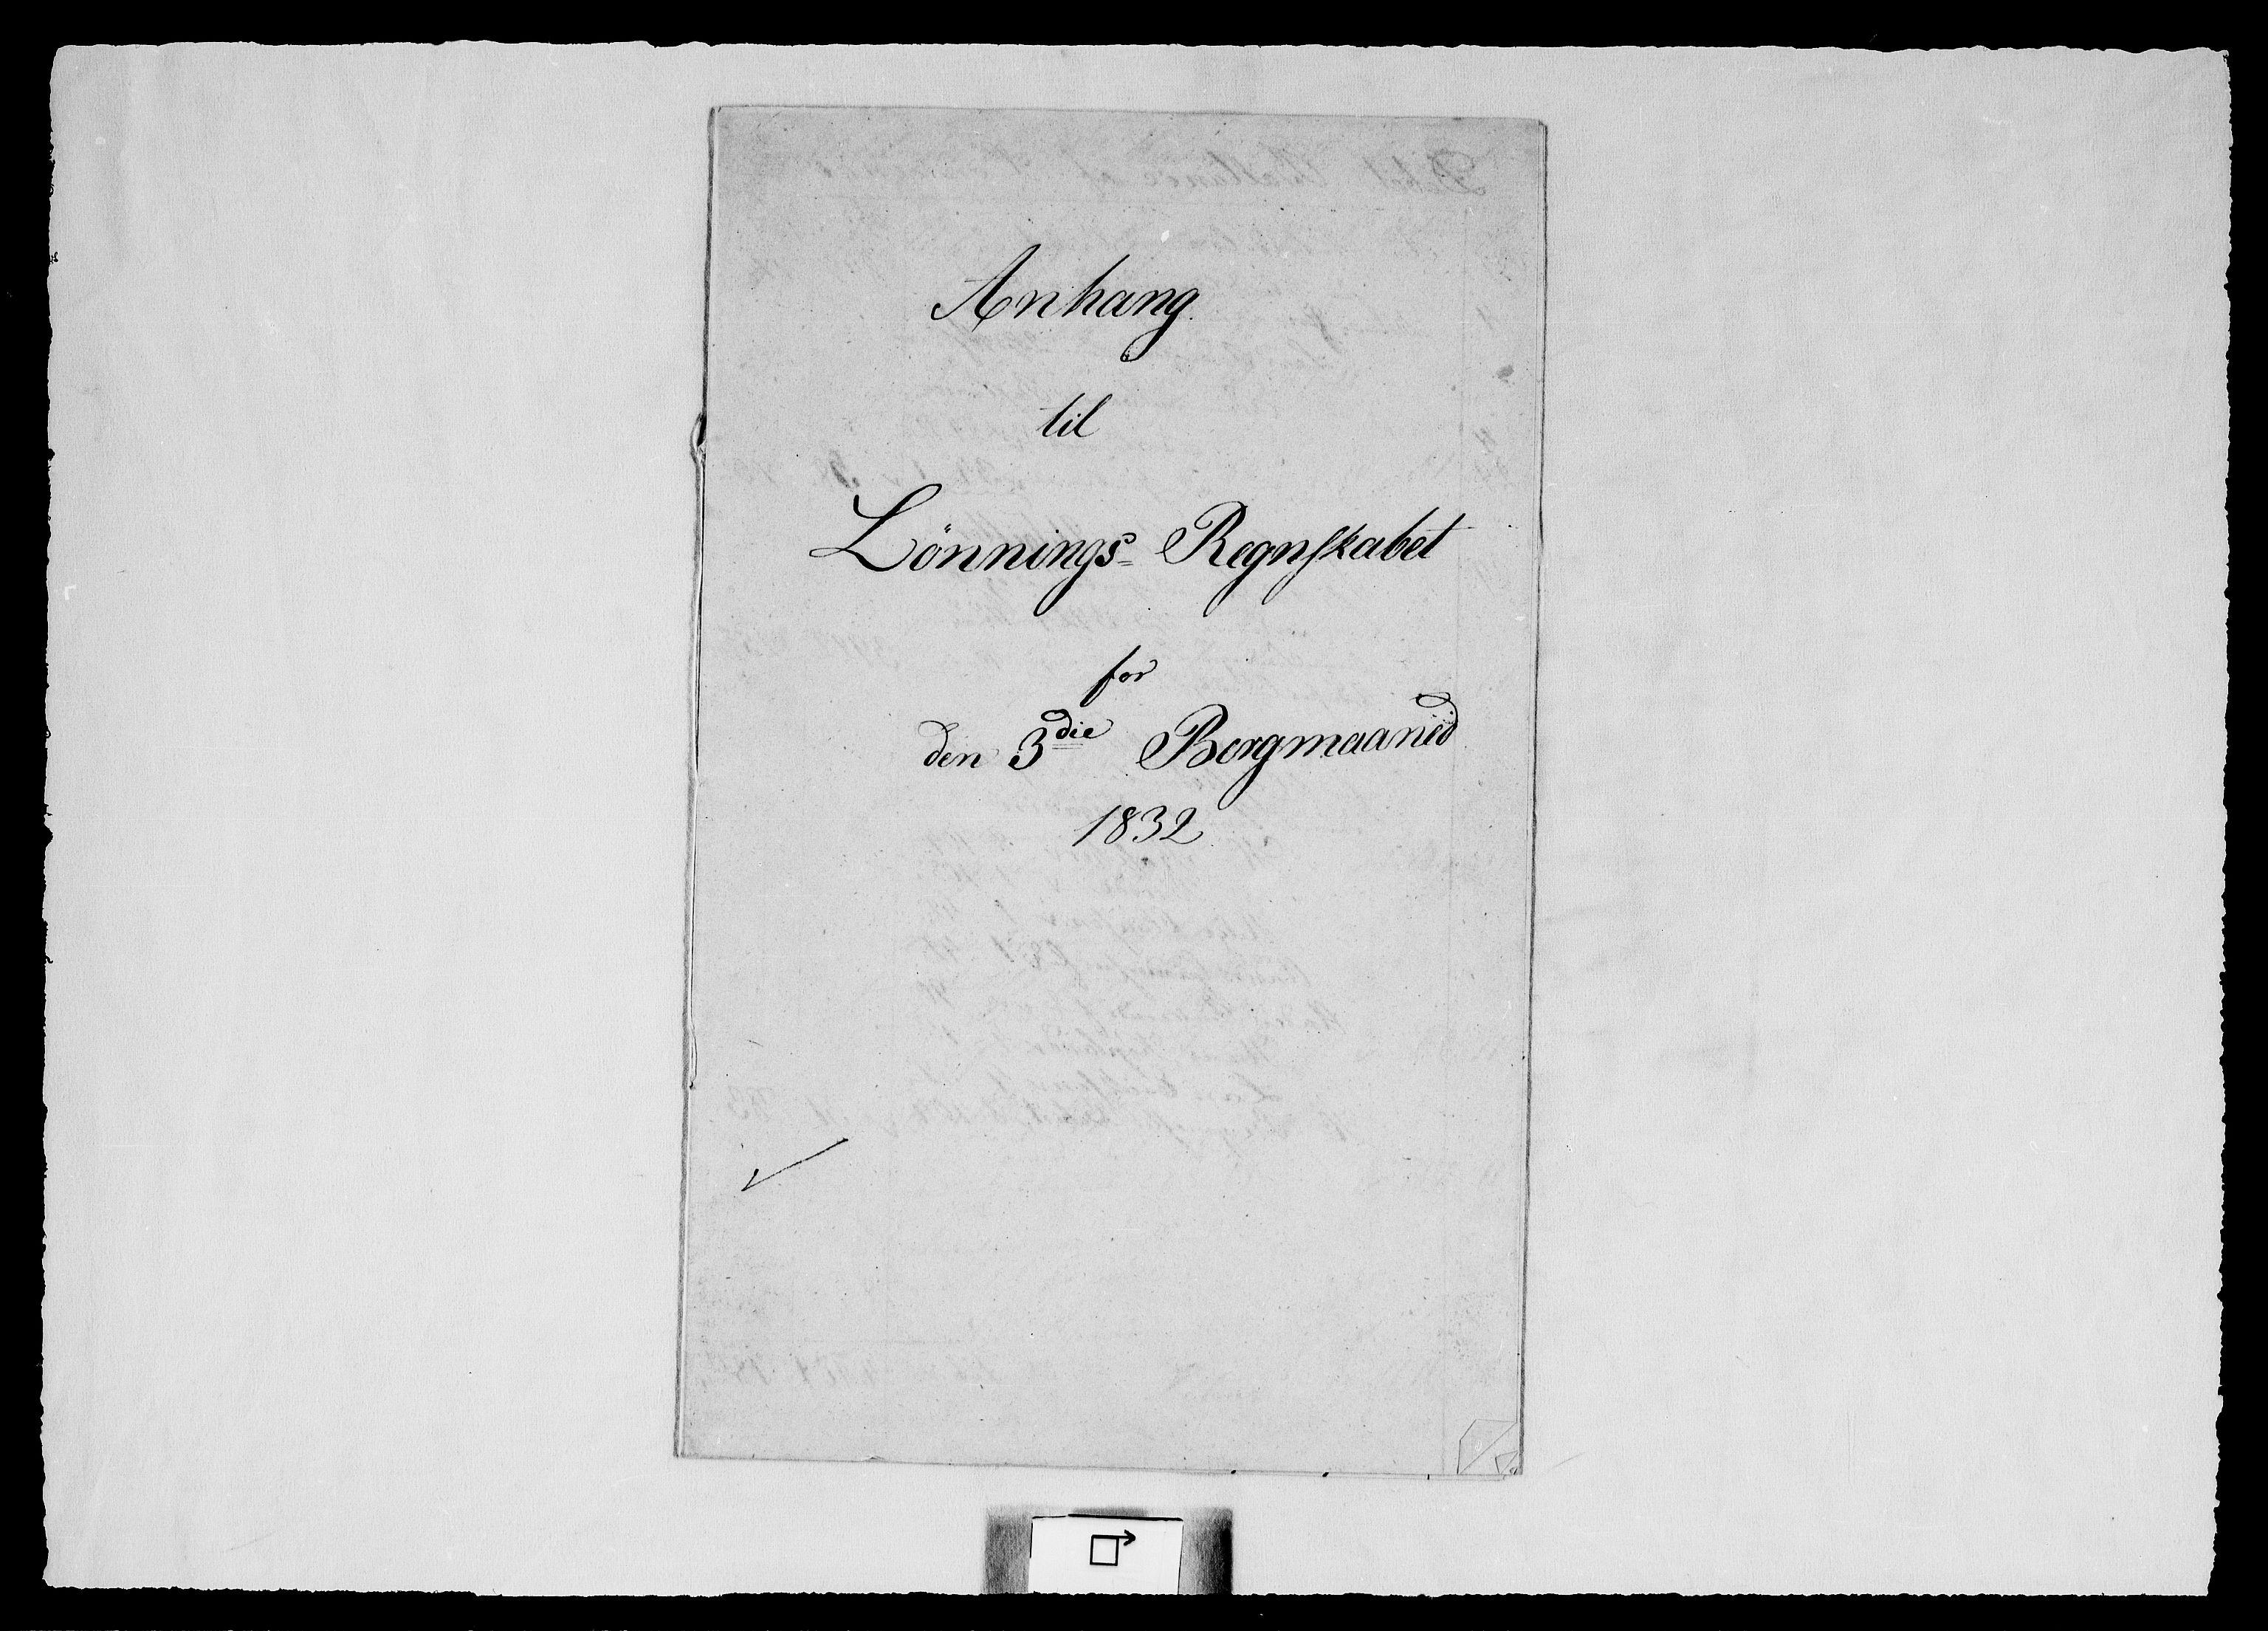 RA, Modums Blaafarveværk, G/Gd/Gdd/L0285, 1832-1839, s. 2